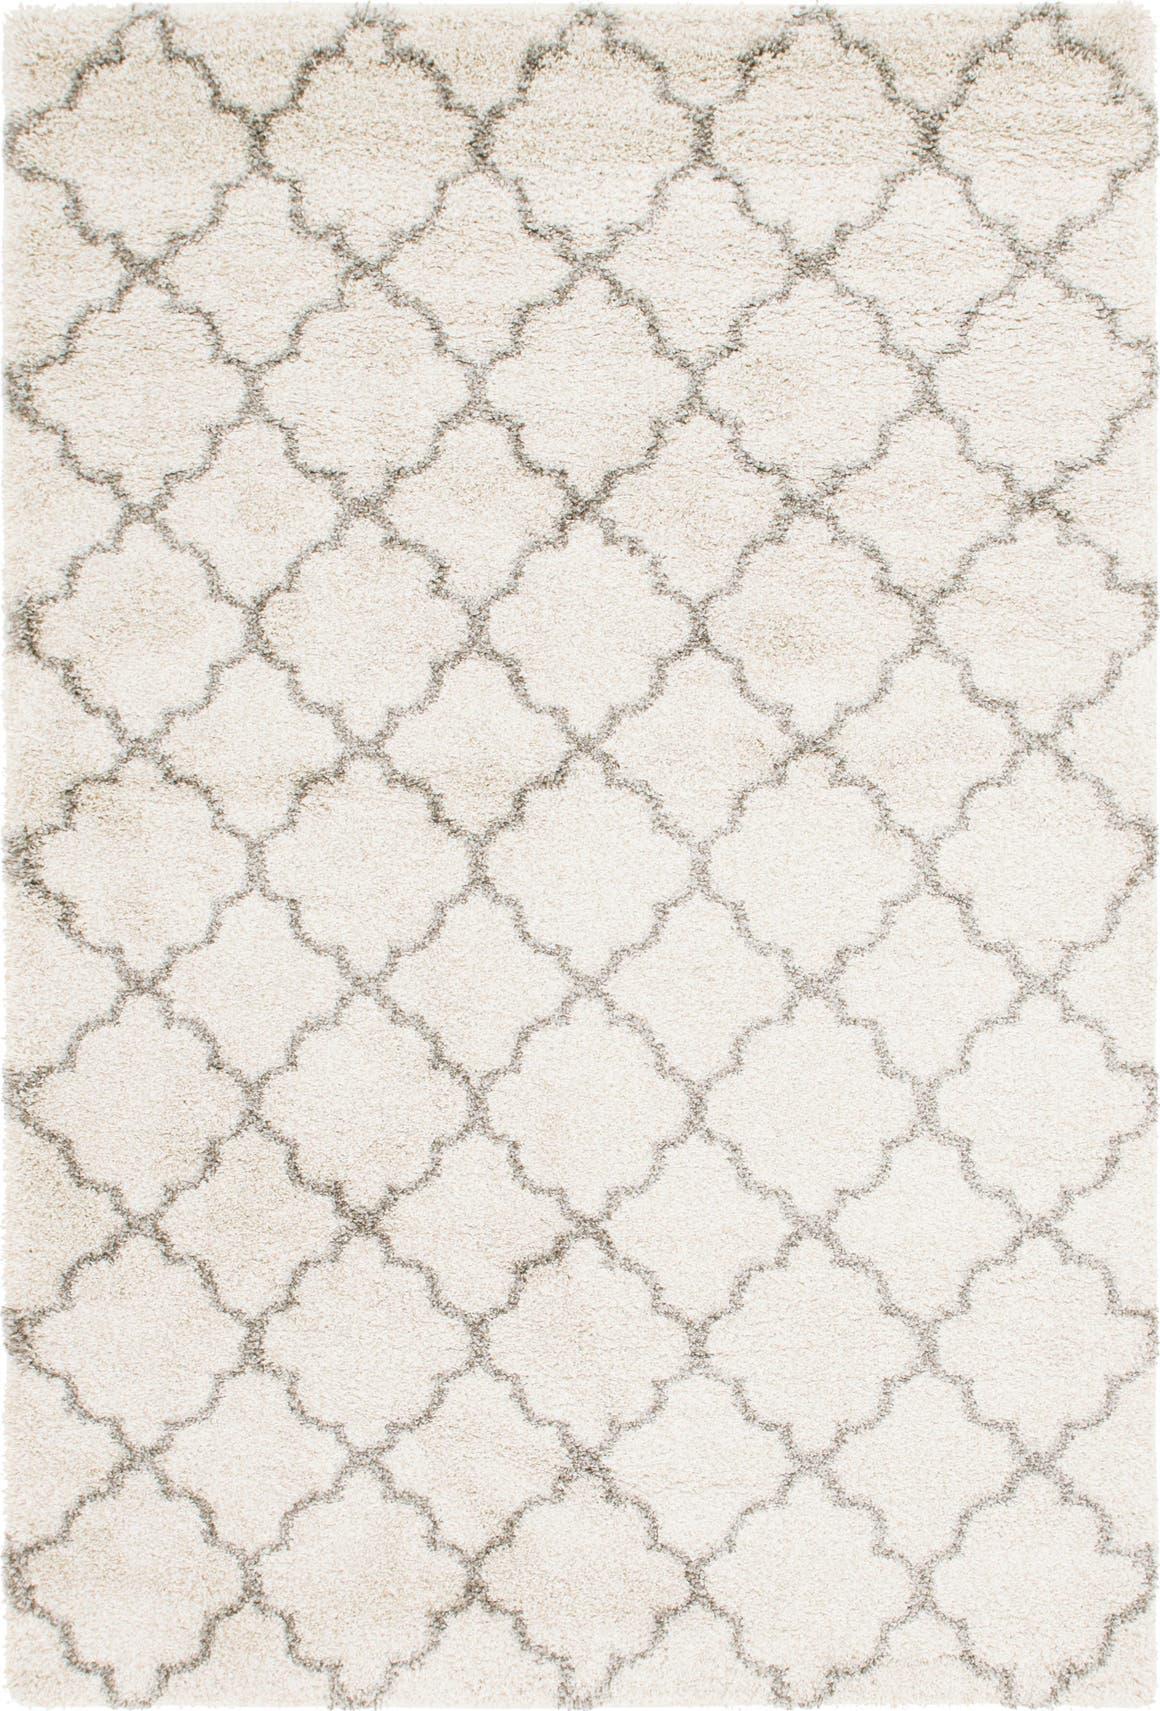 6' 2 x 9' Textured Shag Rug main image